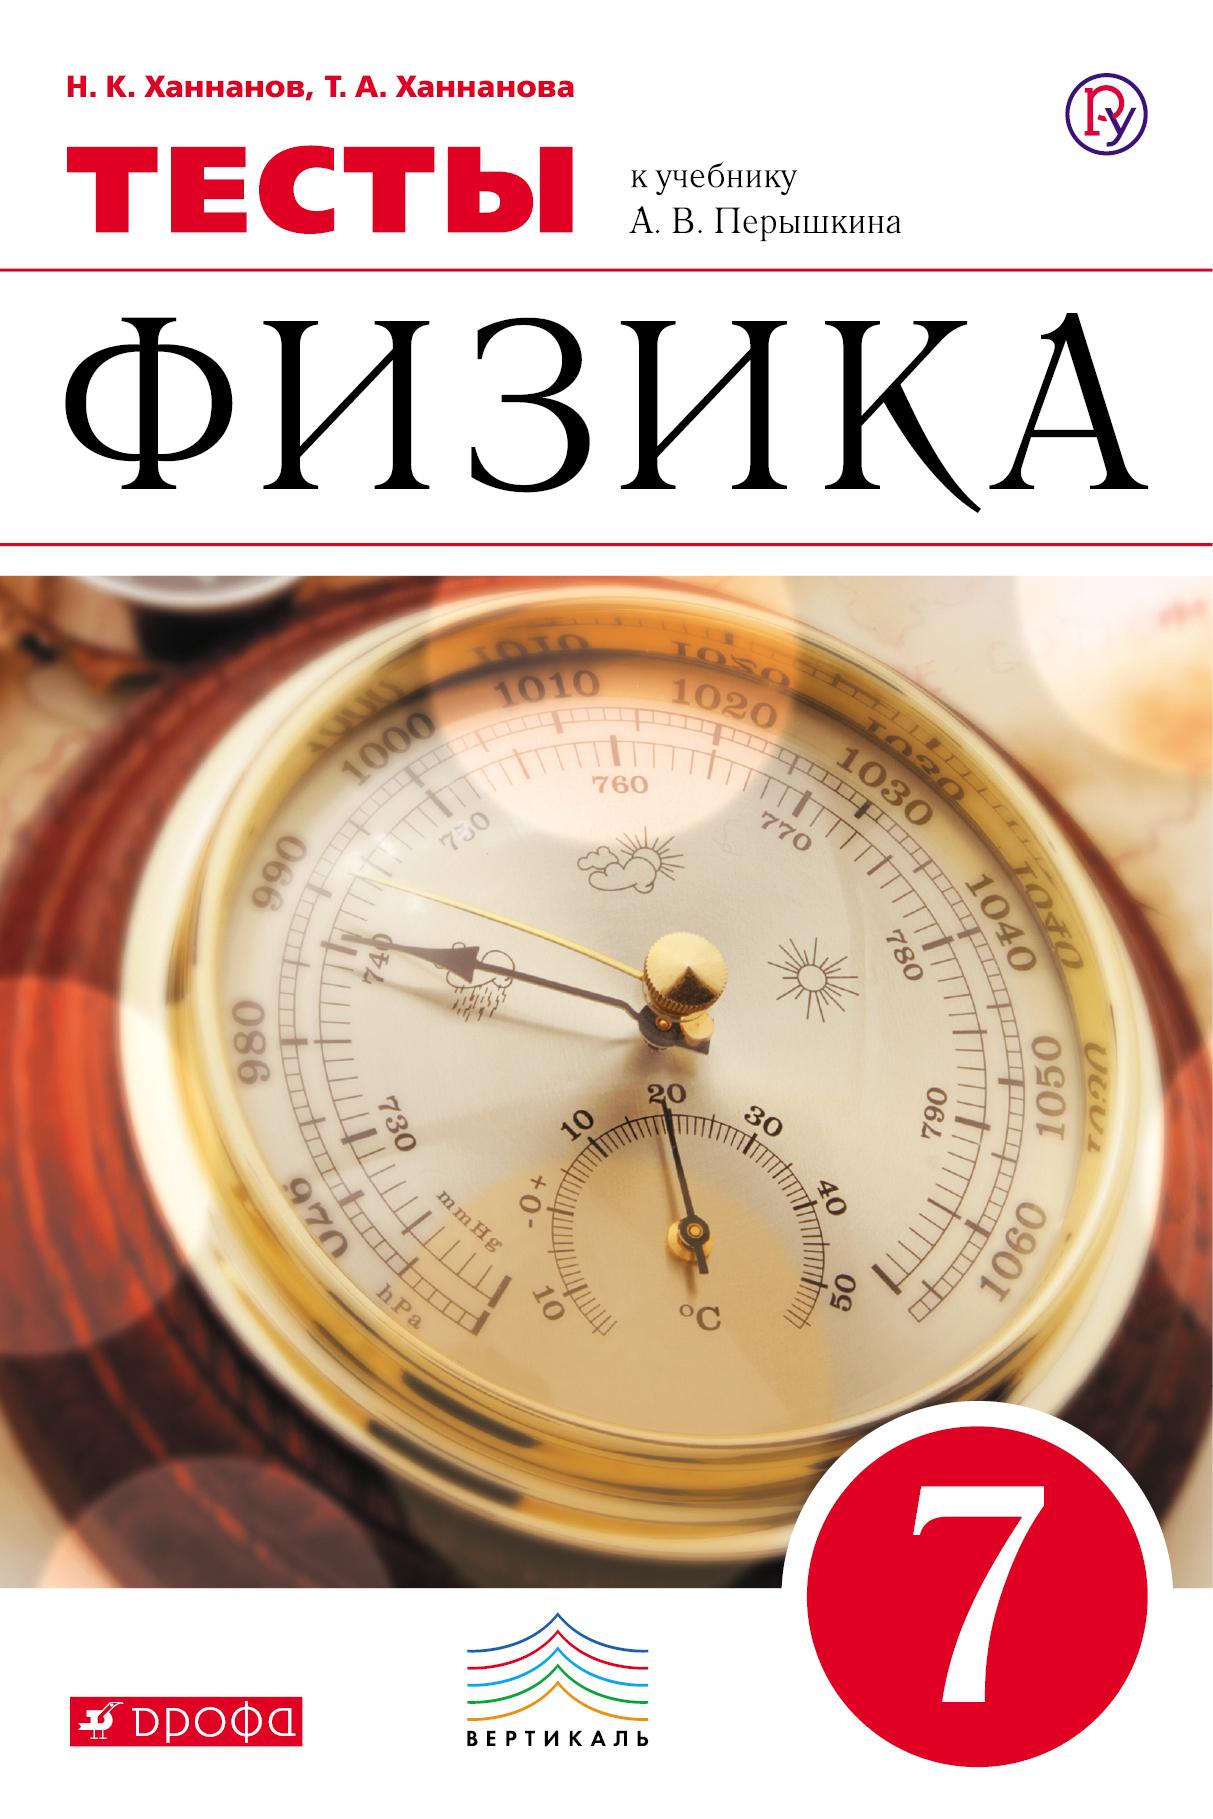 Физика. 7 класс. Тесты. ( Ханнанов Н.К., Ханнанова Т.А.  )